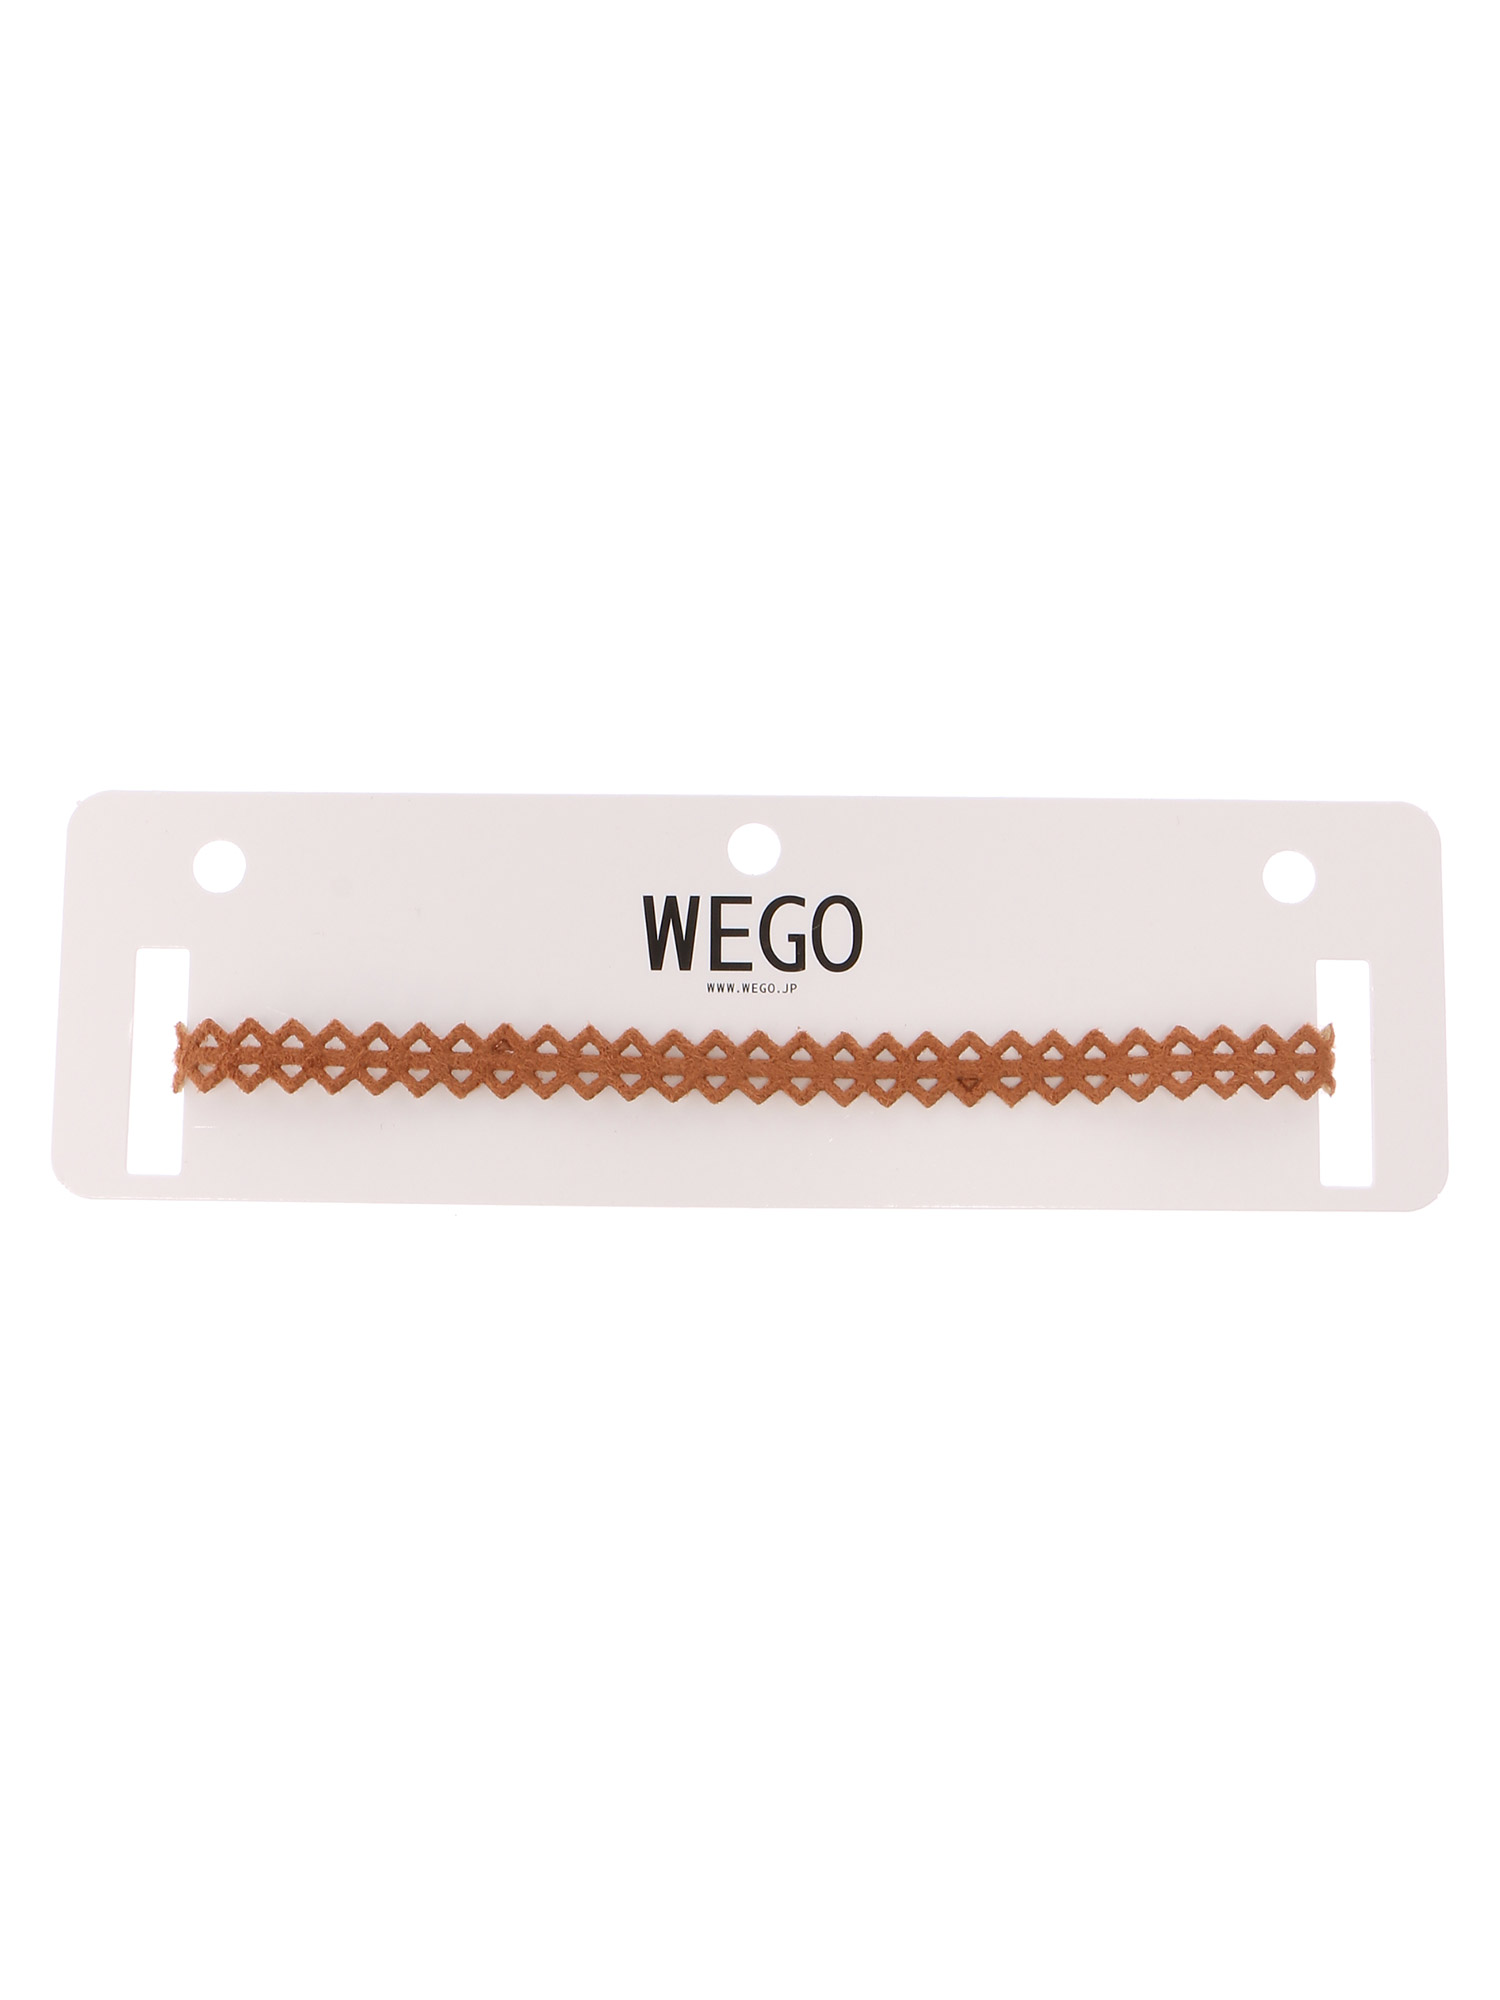 WEGO/スエードテープチョーカー